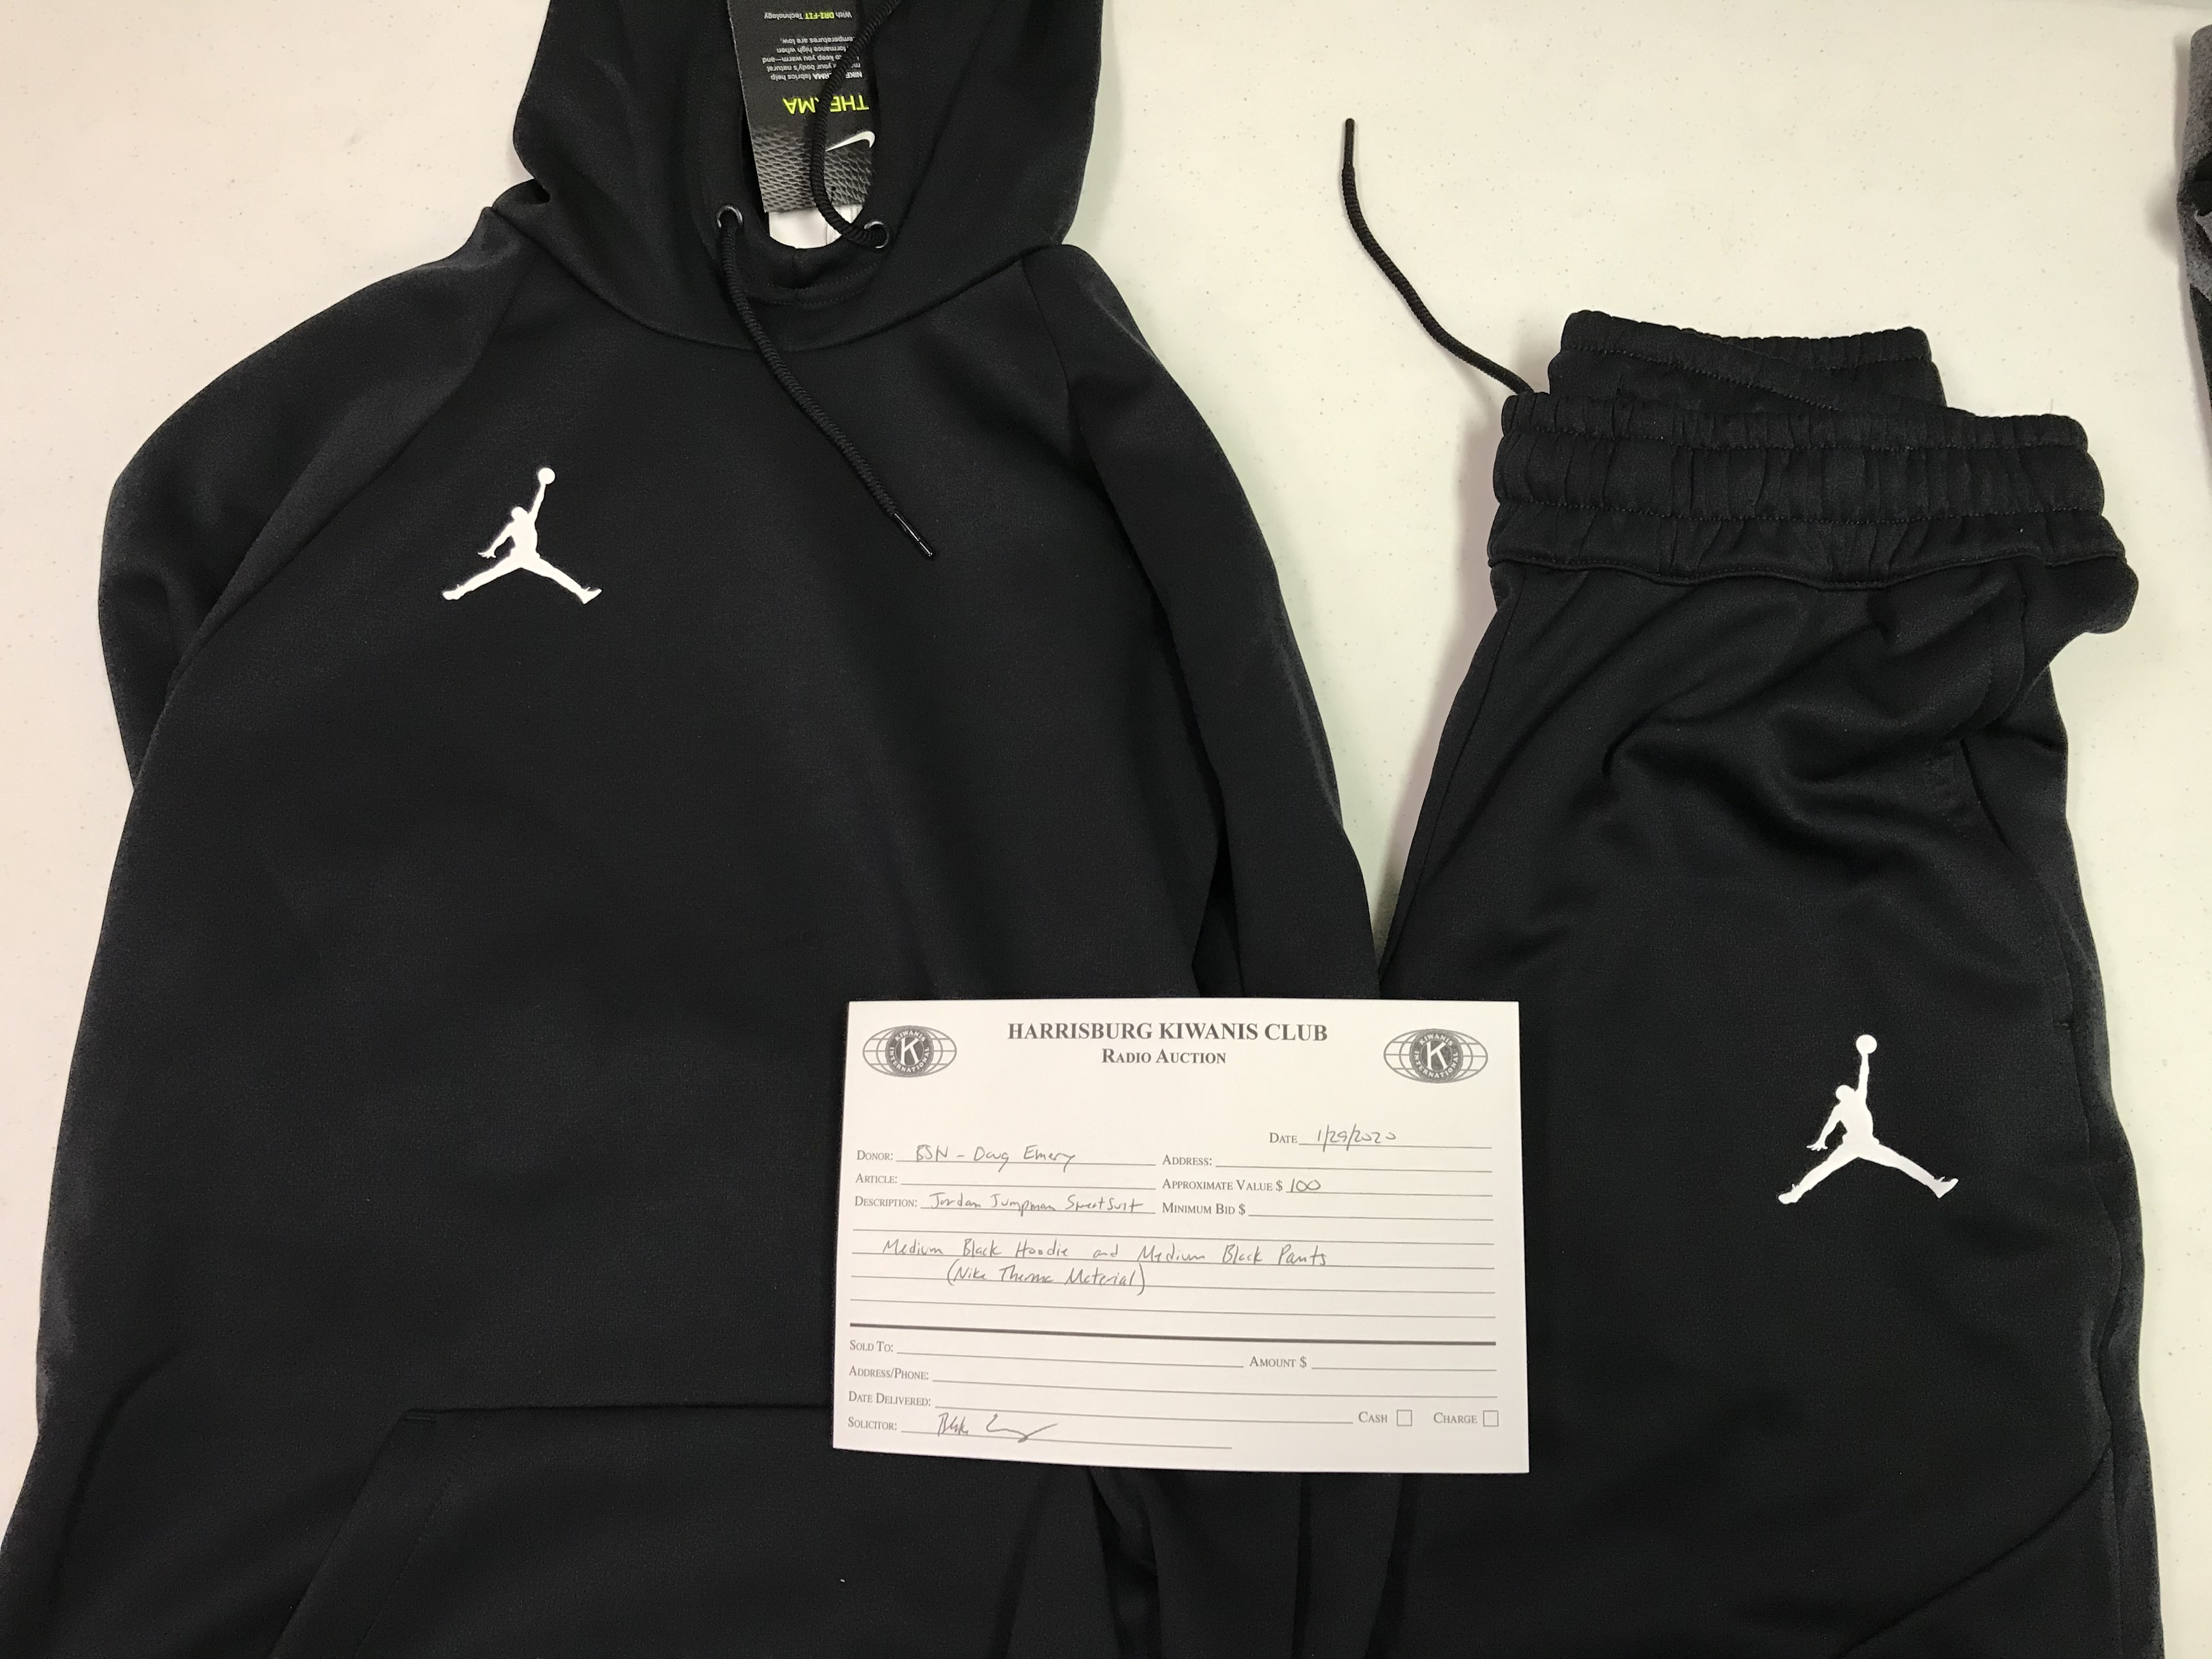 Item 436 - BSN - Doug Emery Jordan Jumpman Sweatsuit - Medium Hoodie and Medium Pants